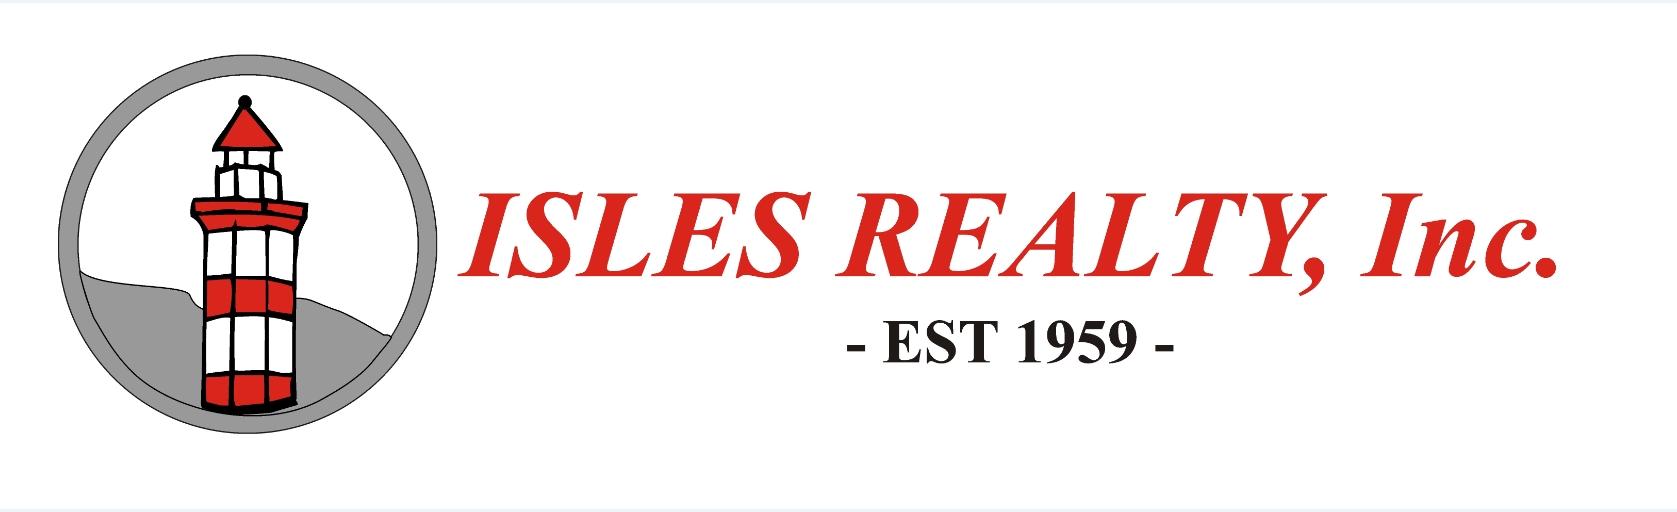 Isles Realty